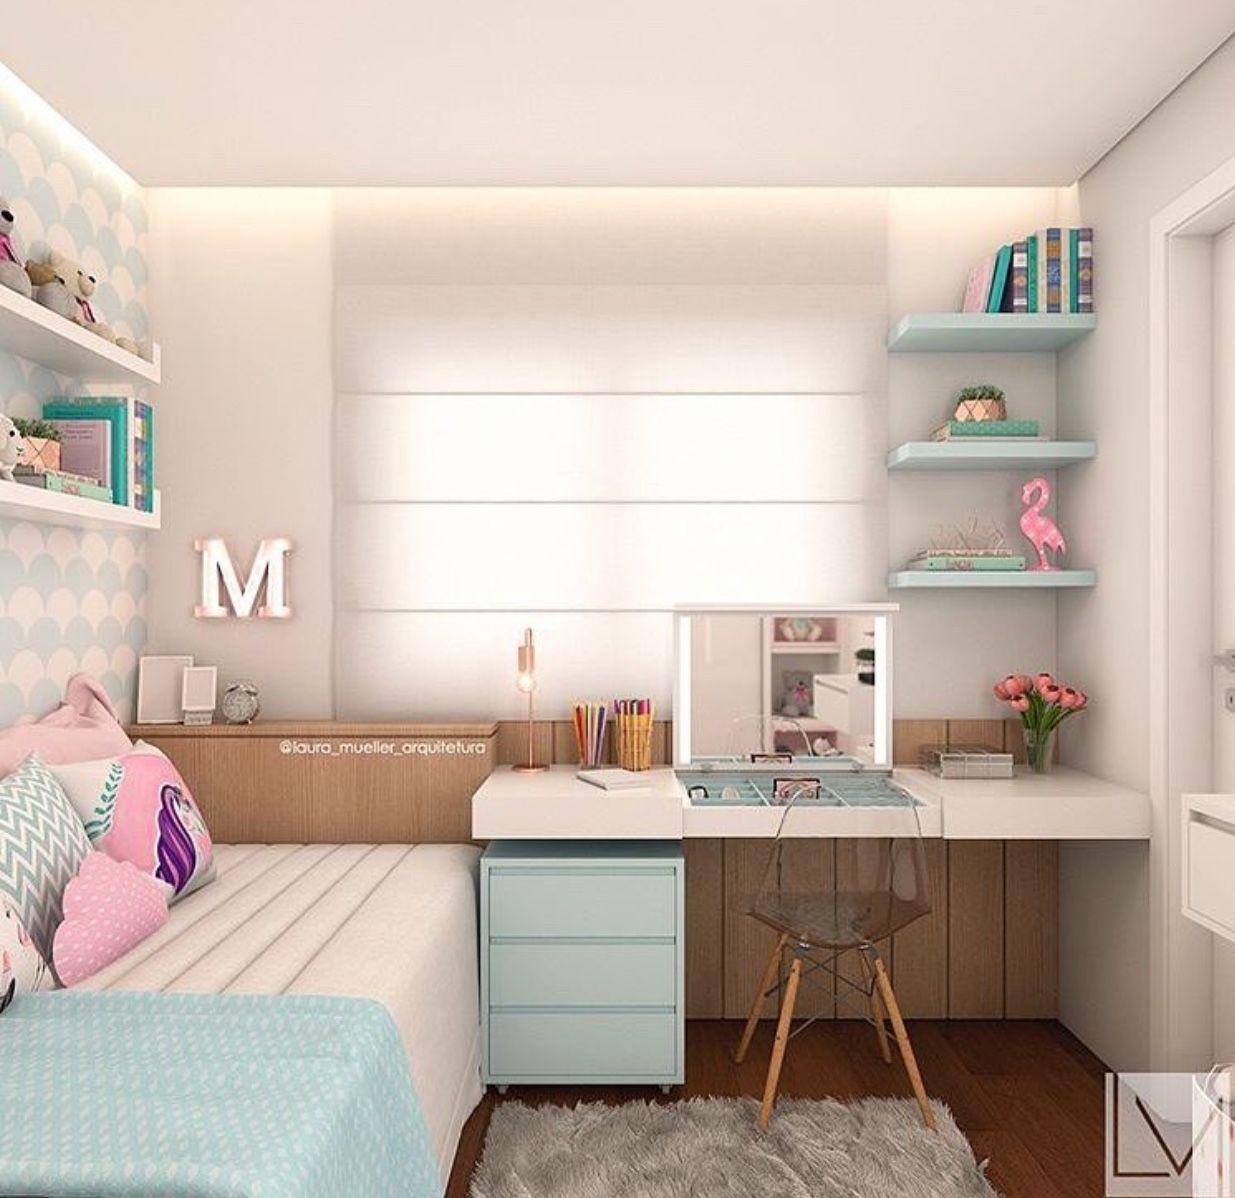 Quarto de garota pinterest dormitorio ideas - Habitaciones juveniles nina ...